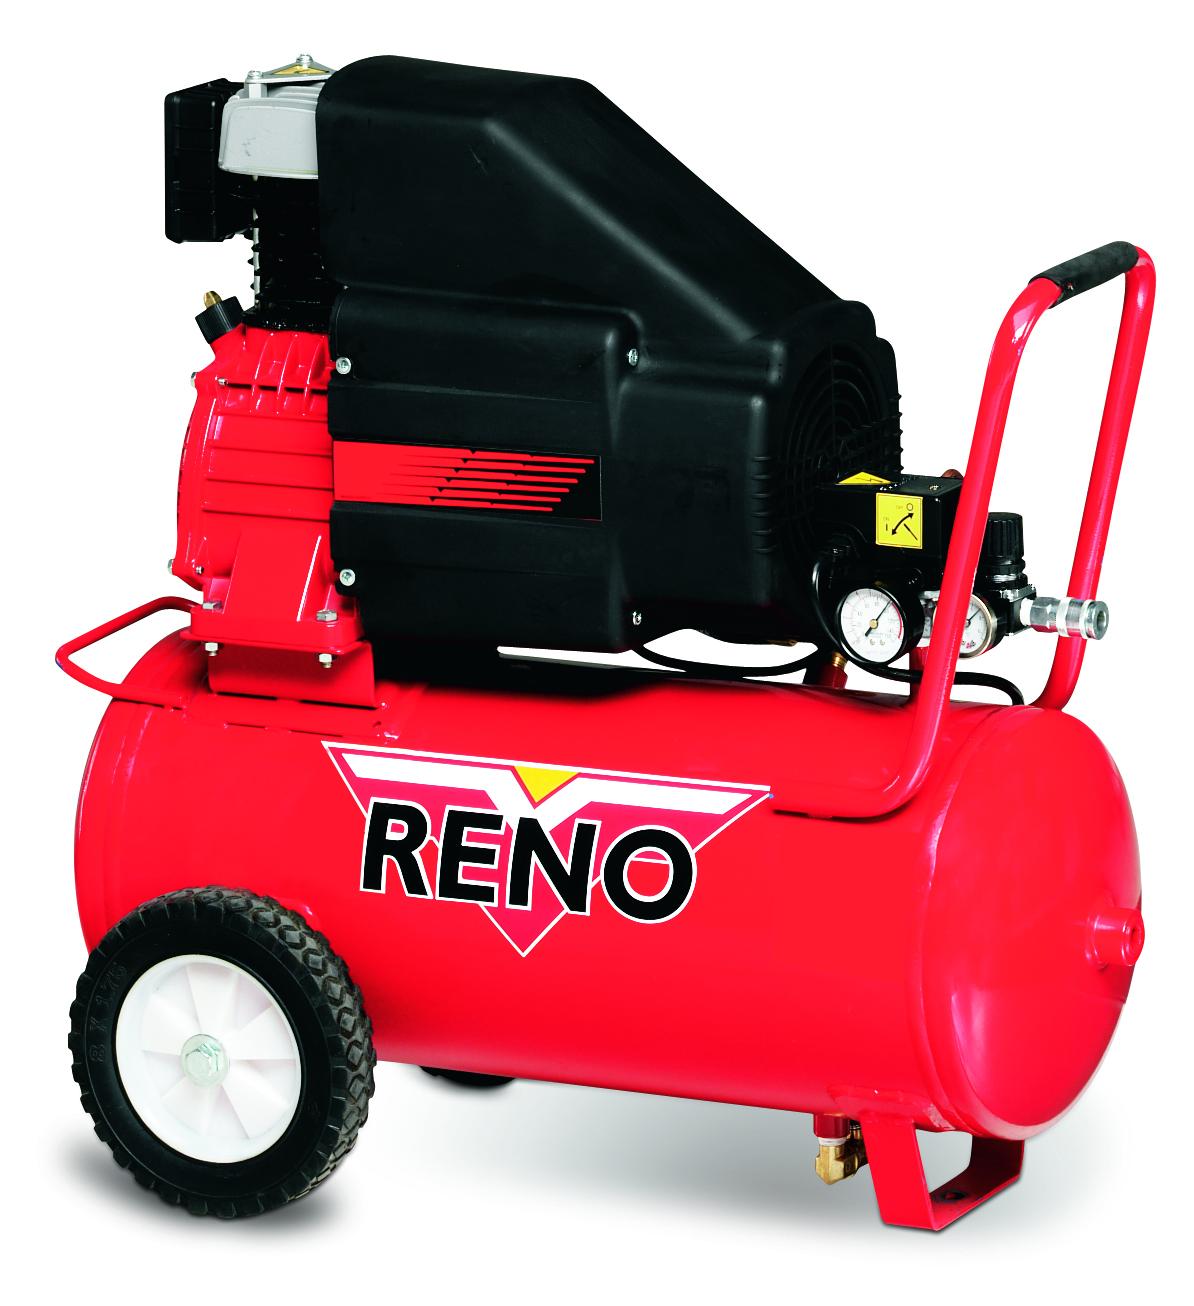 RENO 270/40 Image